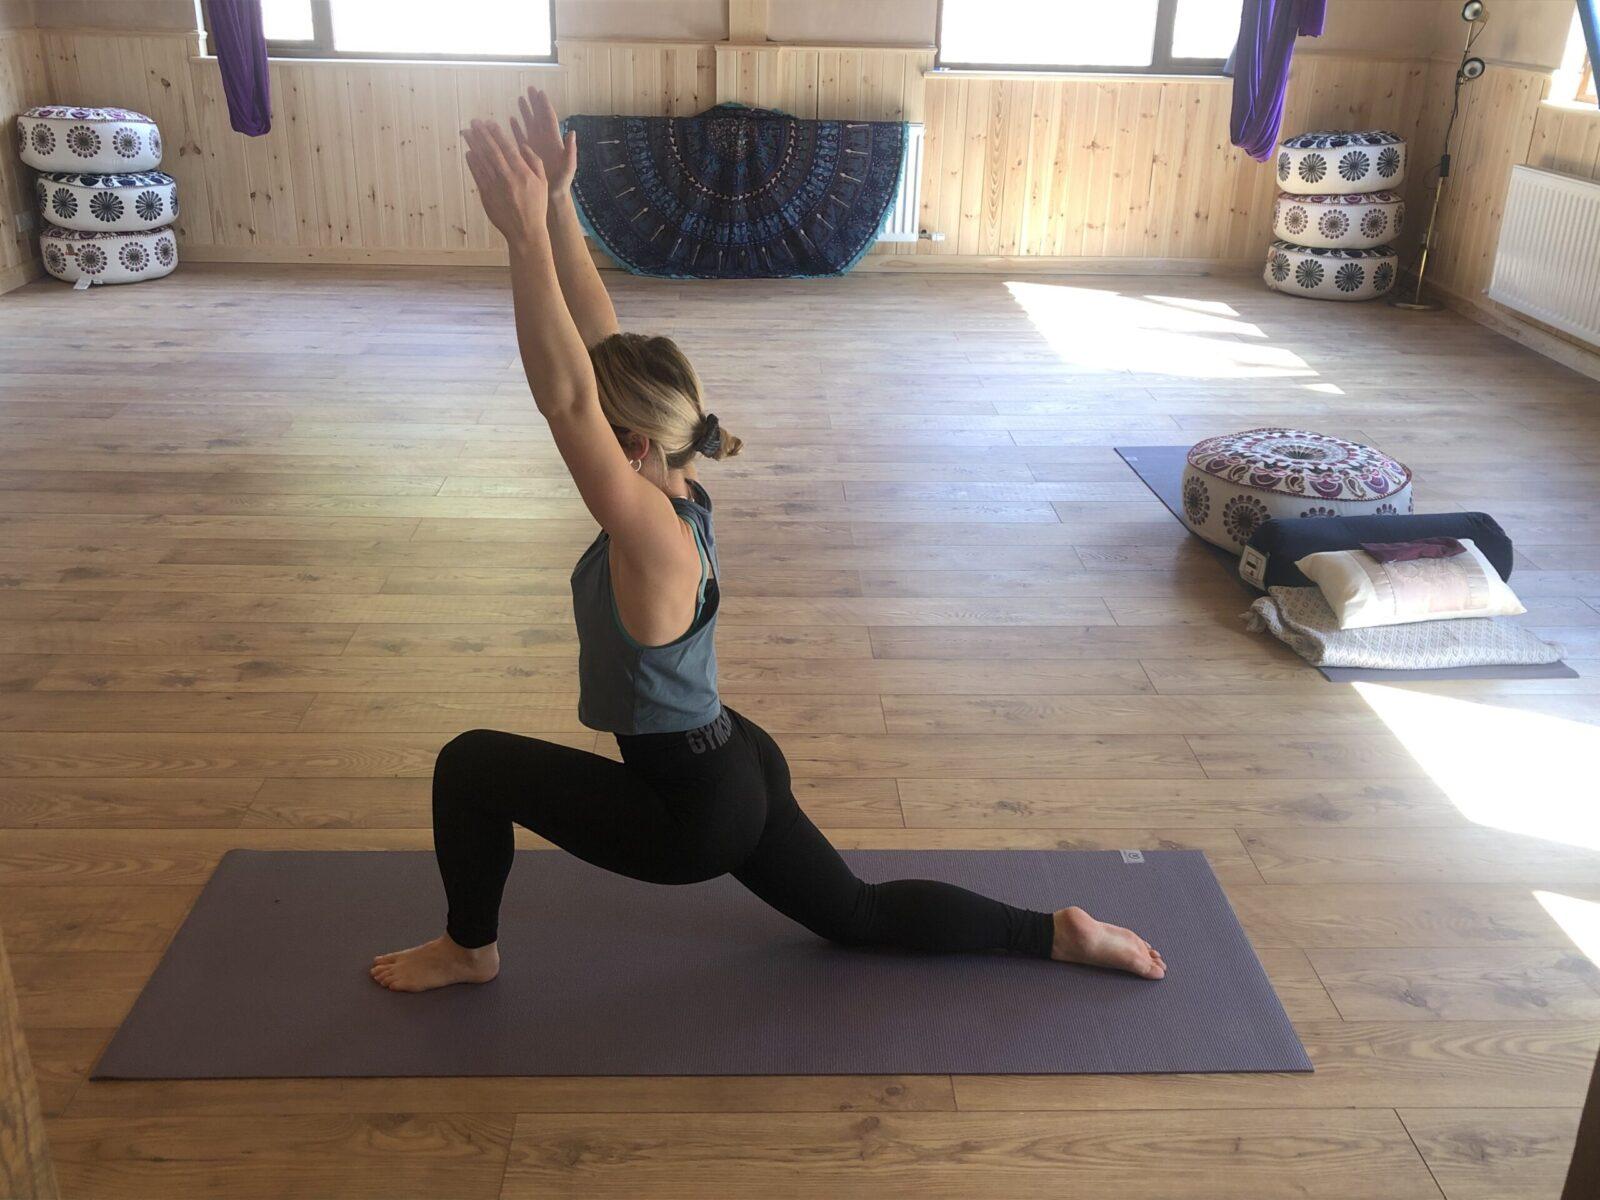 A yoga pose in the Yogandspice studio.